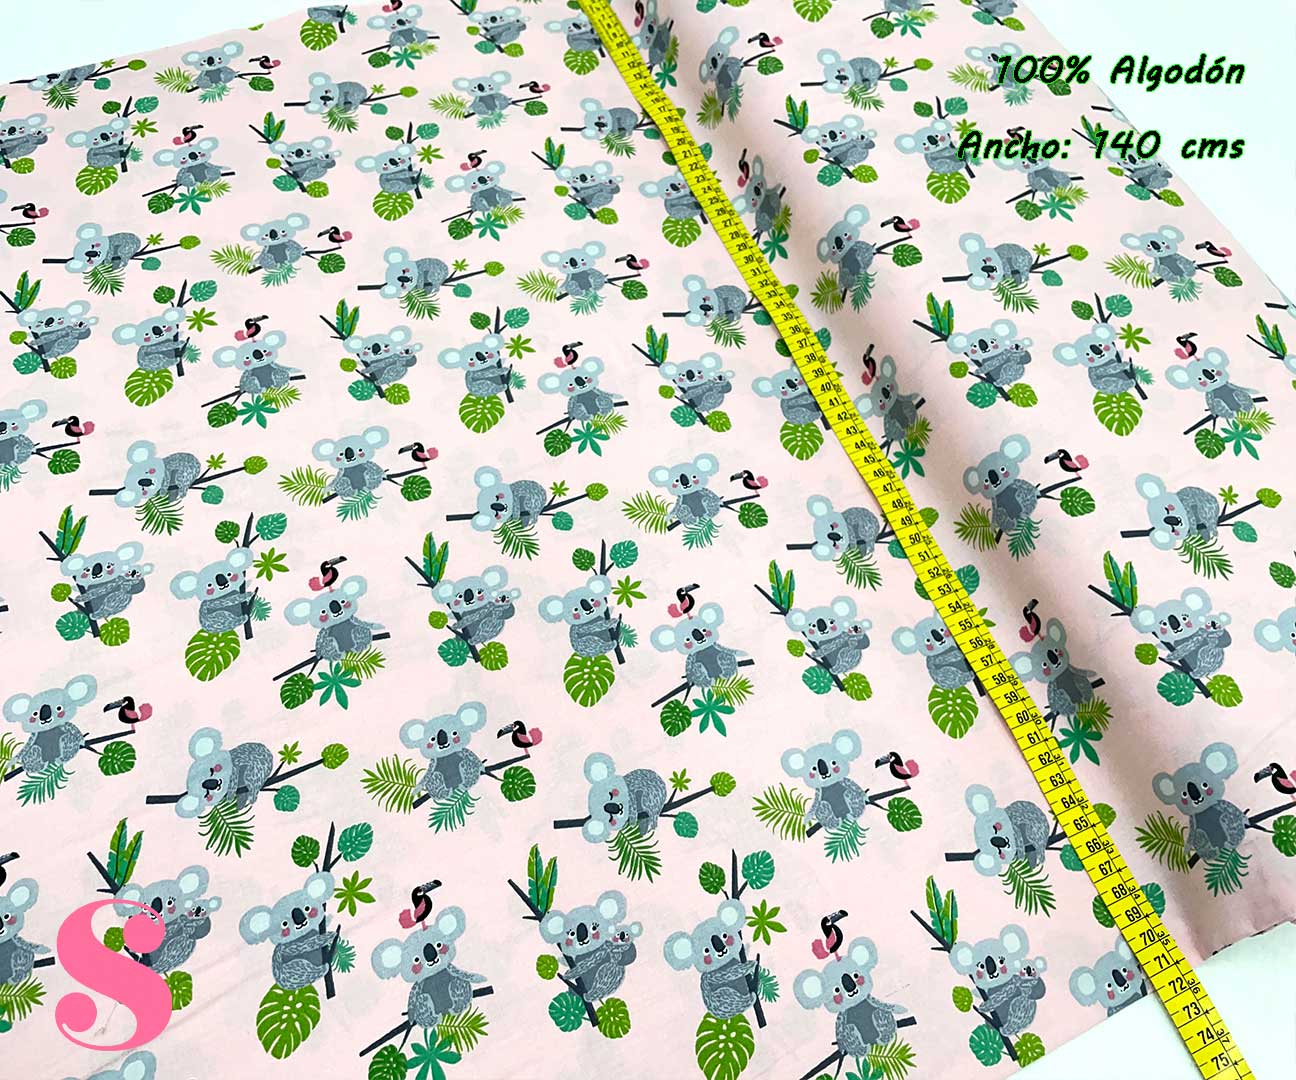 14-telas-estampadas-animales,telas-con-estampados-de-primavera,telas-con-estampados-koalas,telas-infantiles,Tejido Estampado Koalas